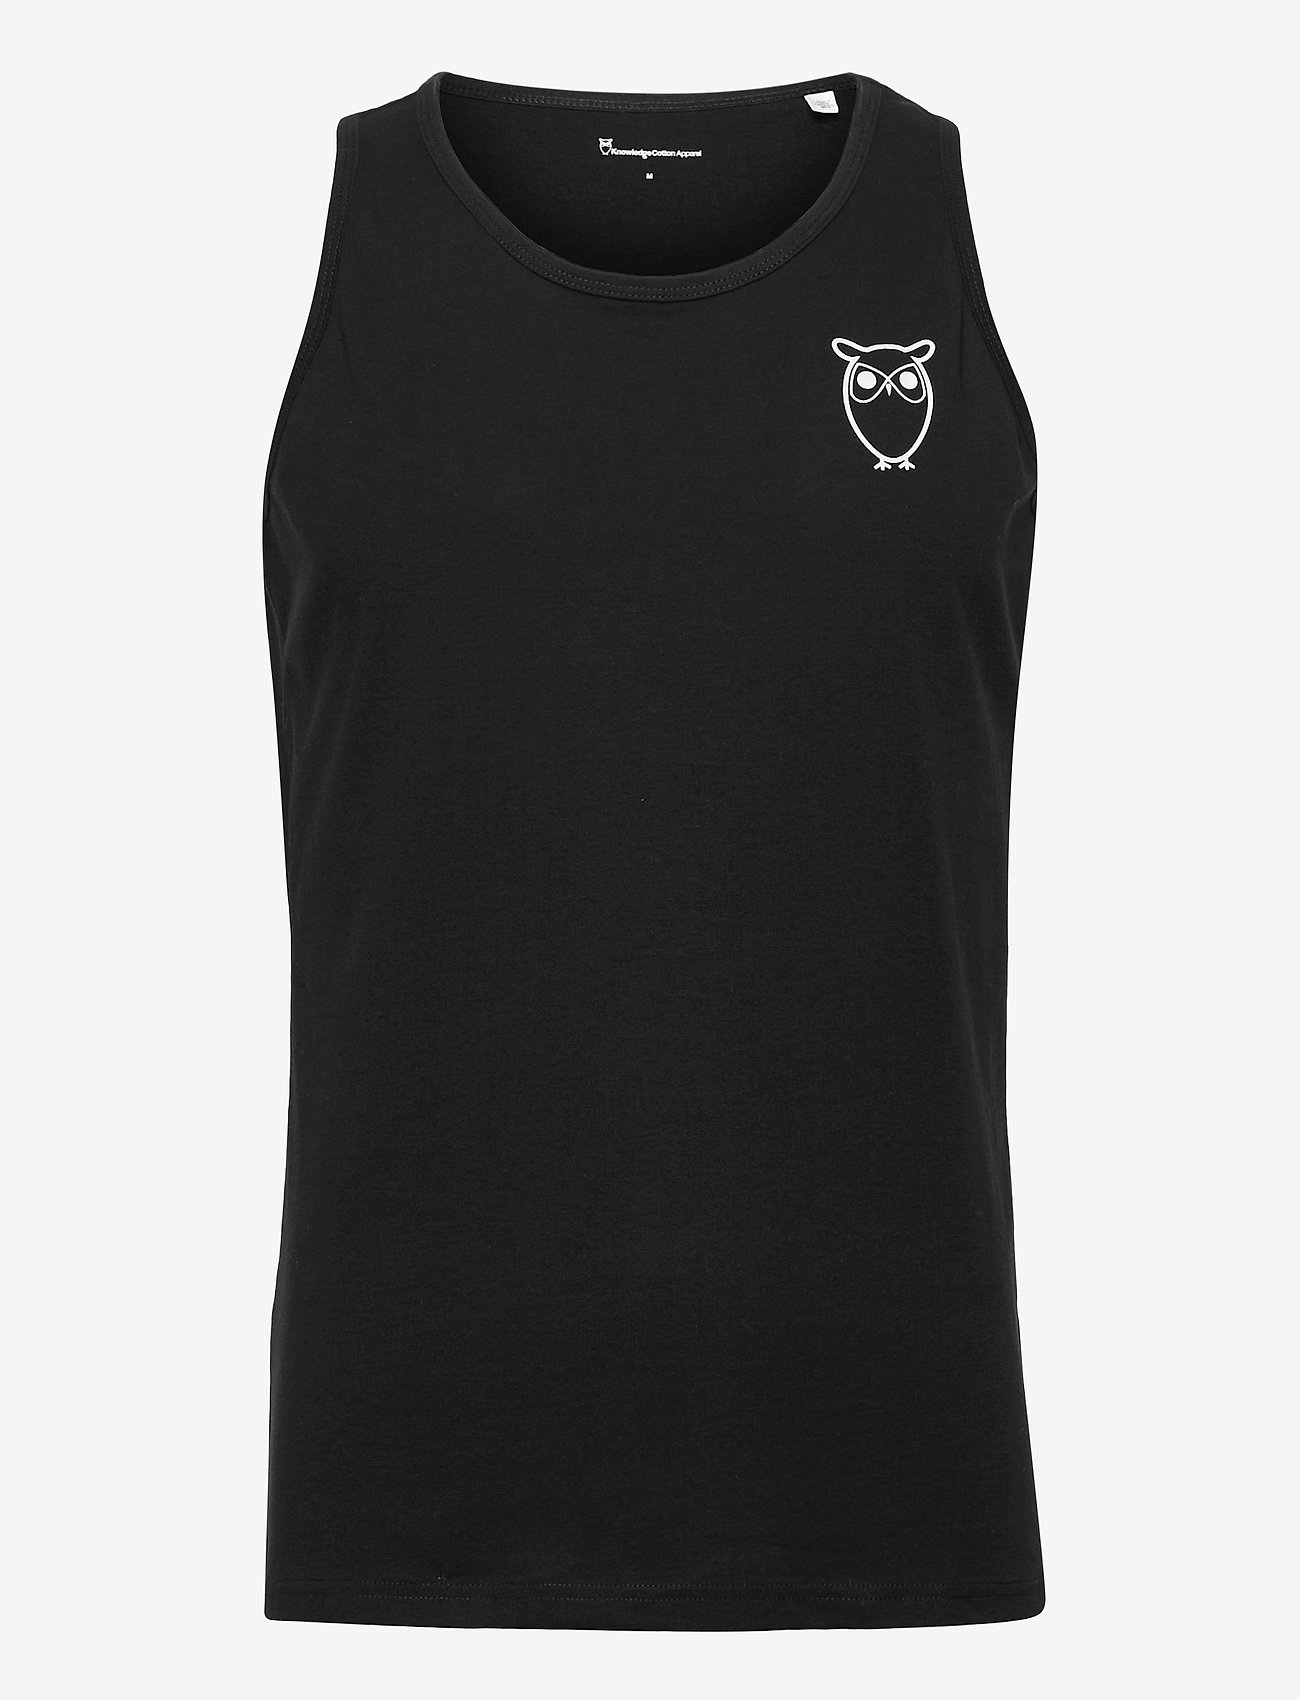 Knowledge Cotton Apparel - PALM owl chest tank top - GOTS/Vega - mouwenloze t-shirts - black jet - 0